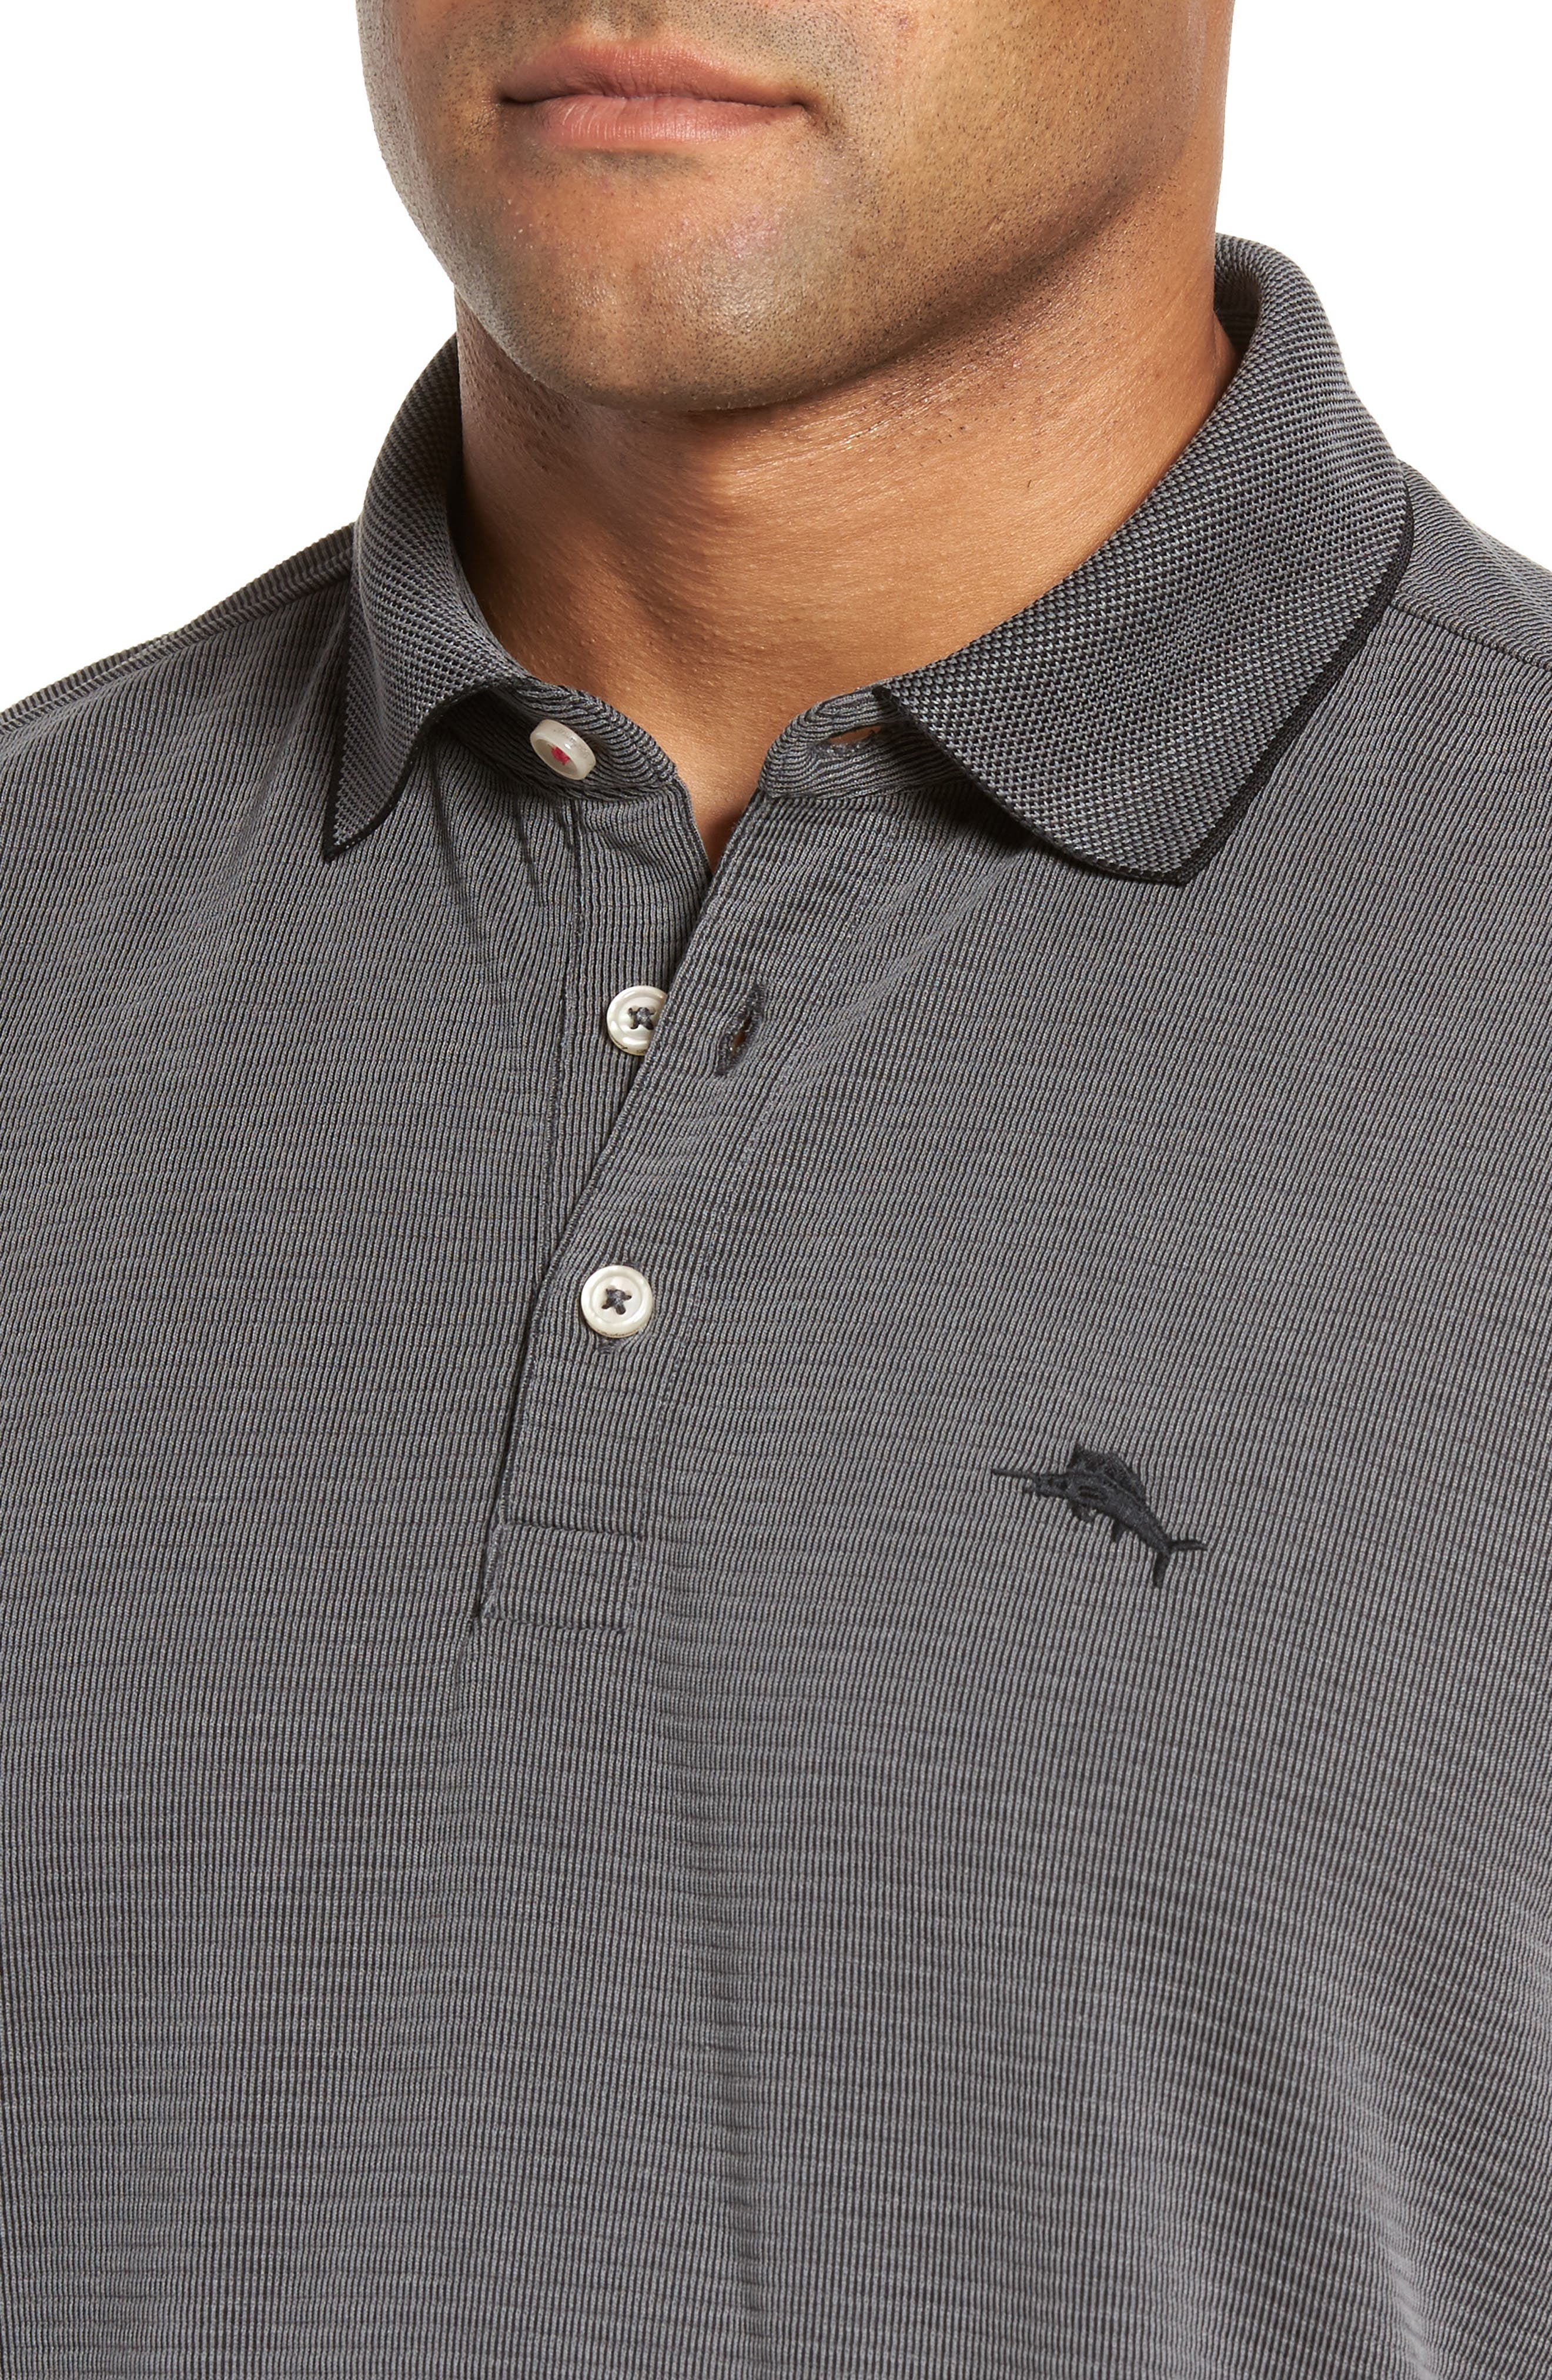 TOMMY BAHAMA, Coastal Crest Polo, Alternate thumbnail 4, color, BLACK